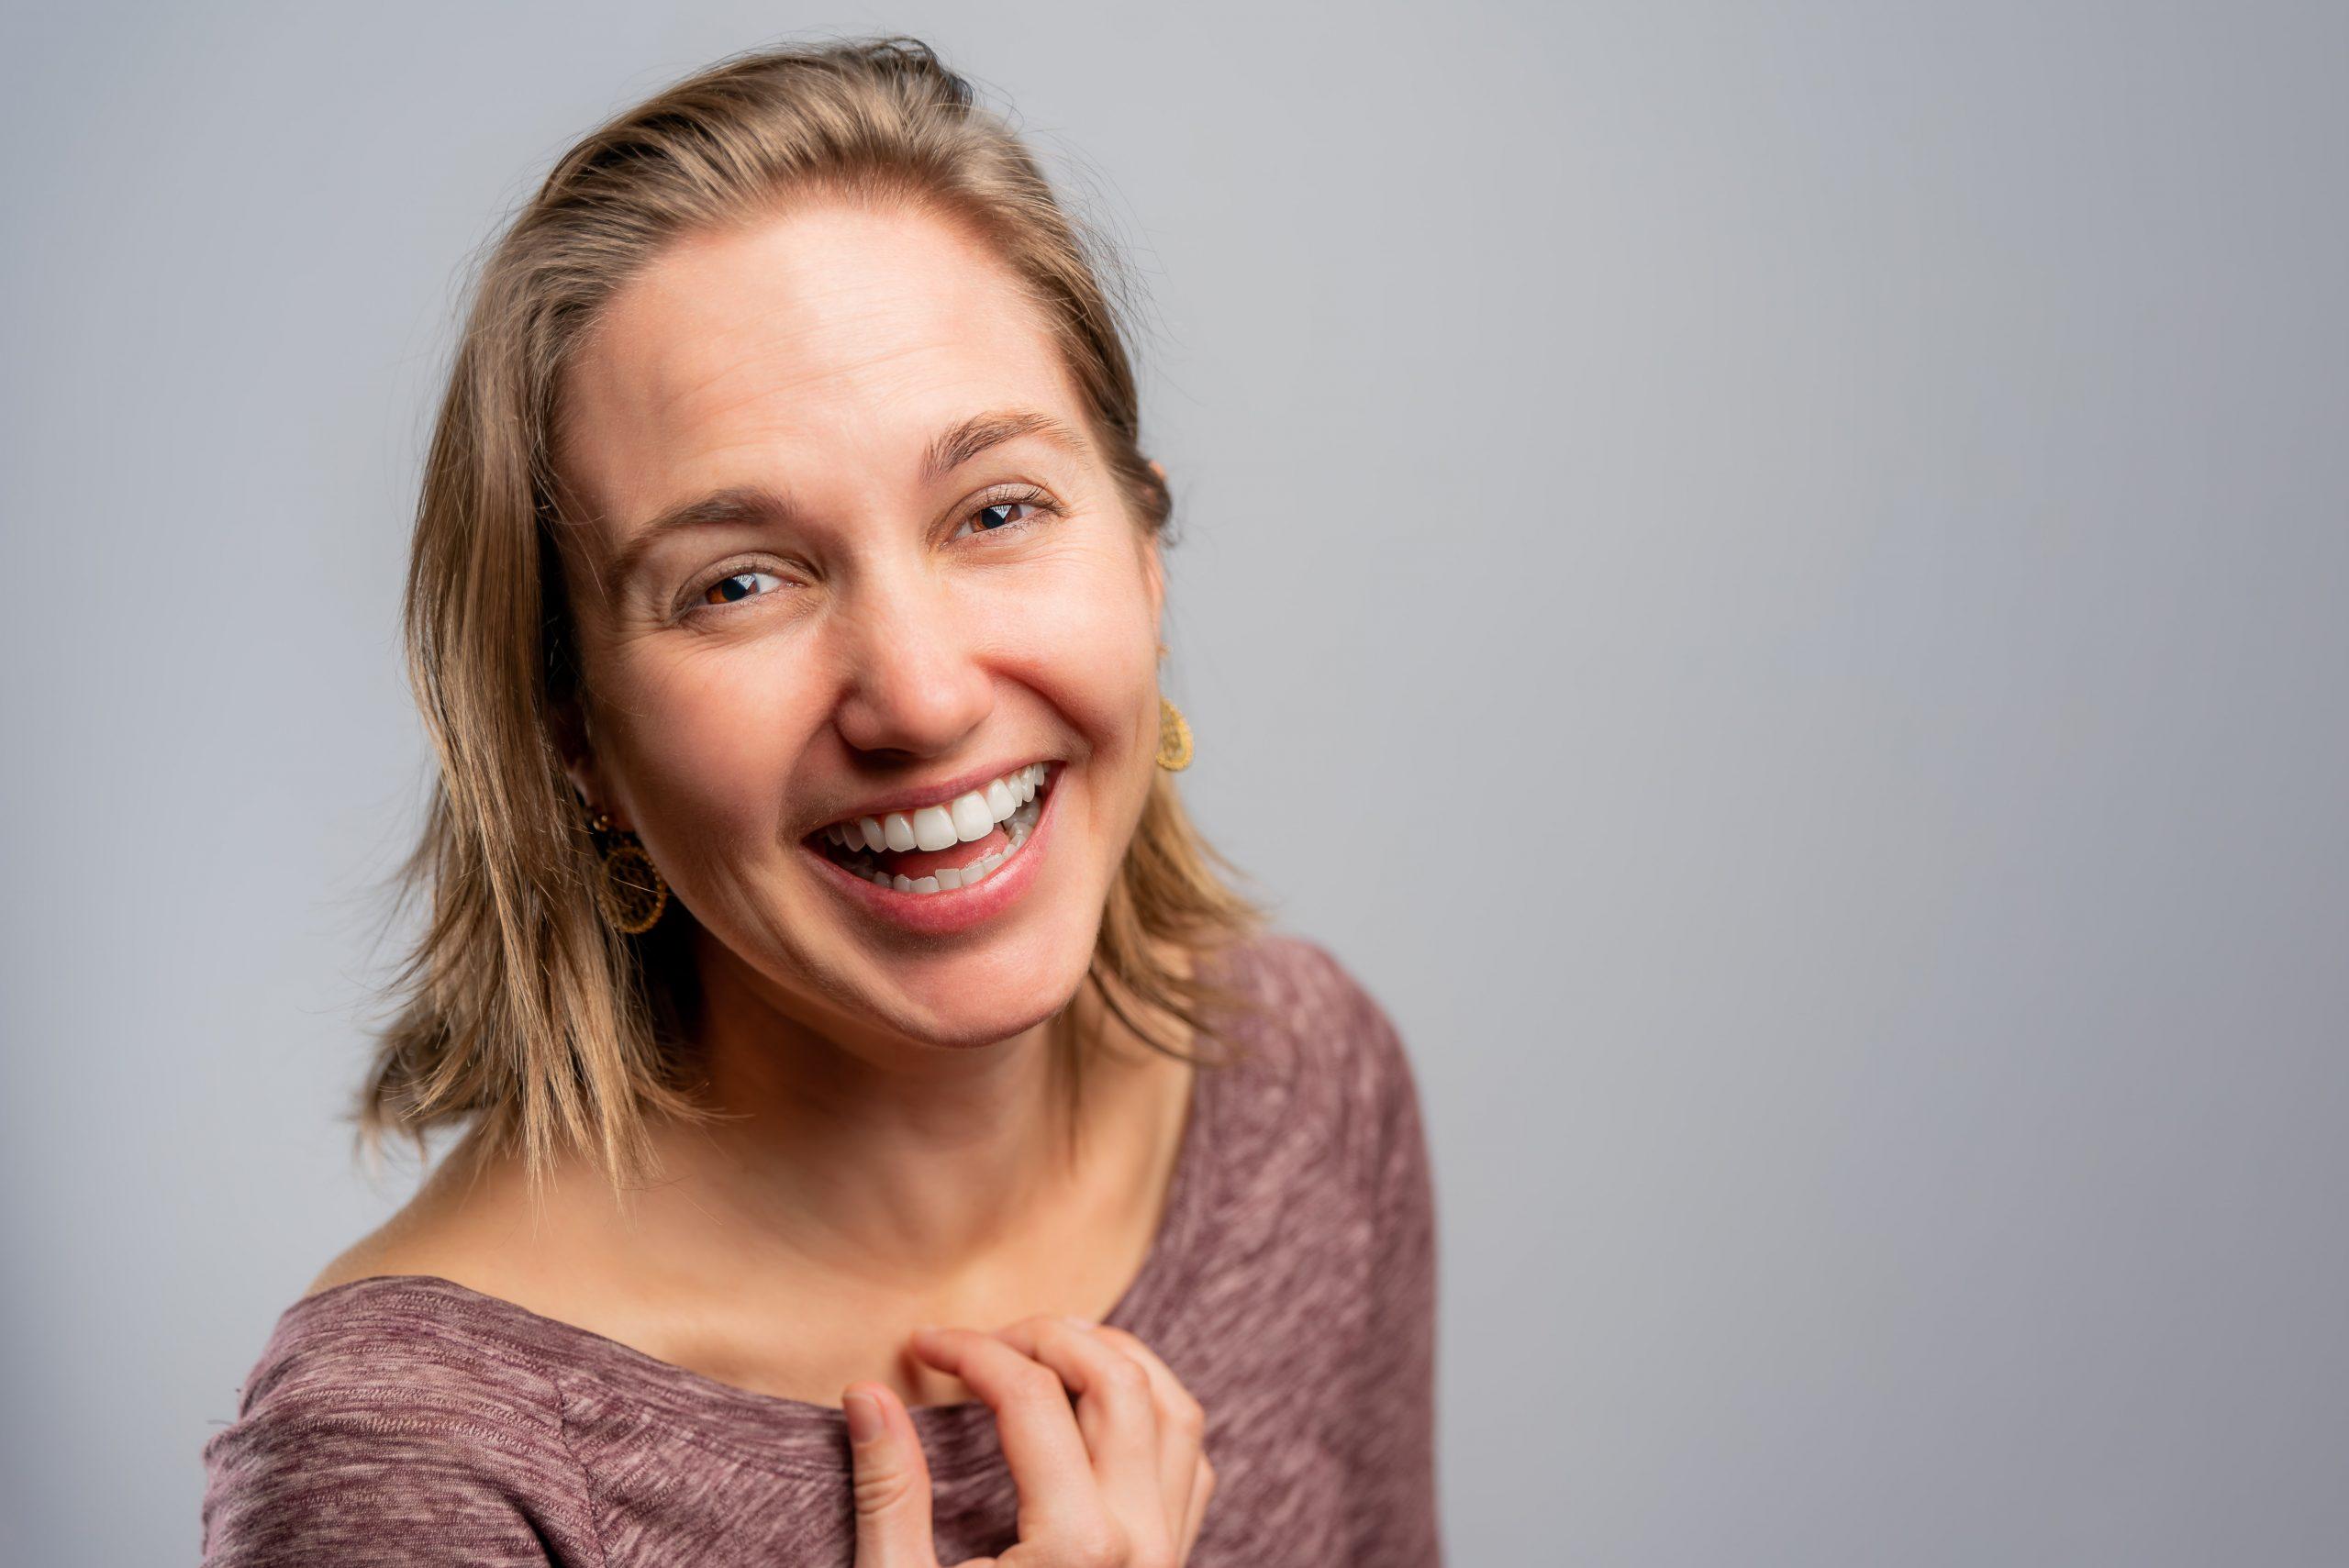 Professional Headshot of Tara on a white background